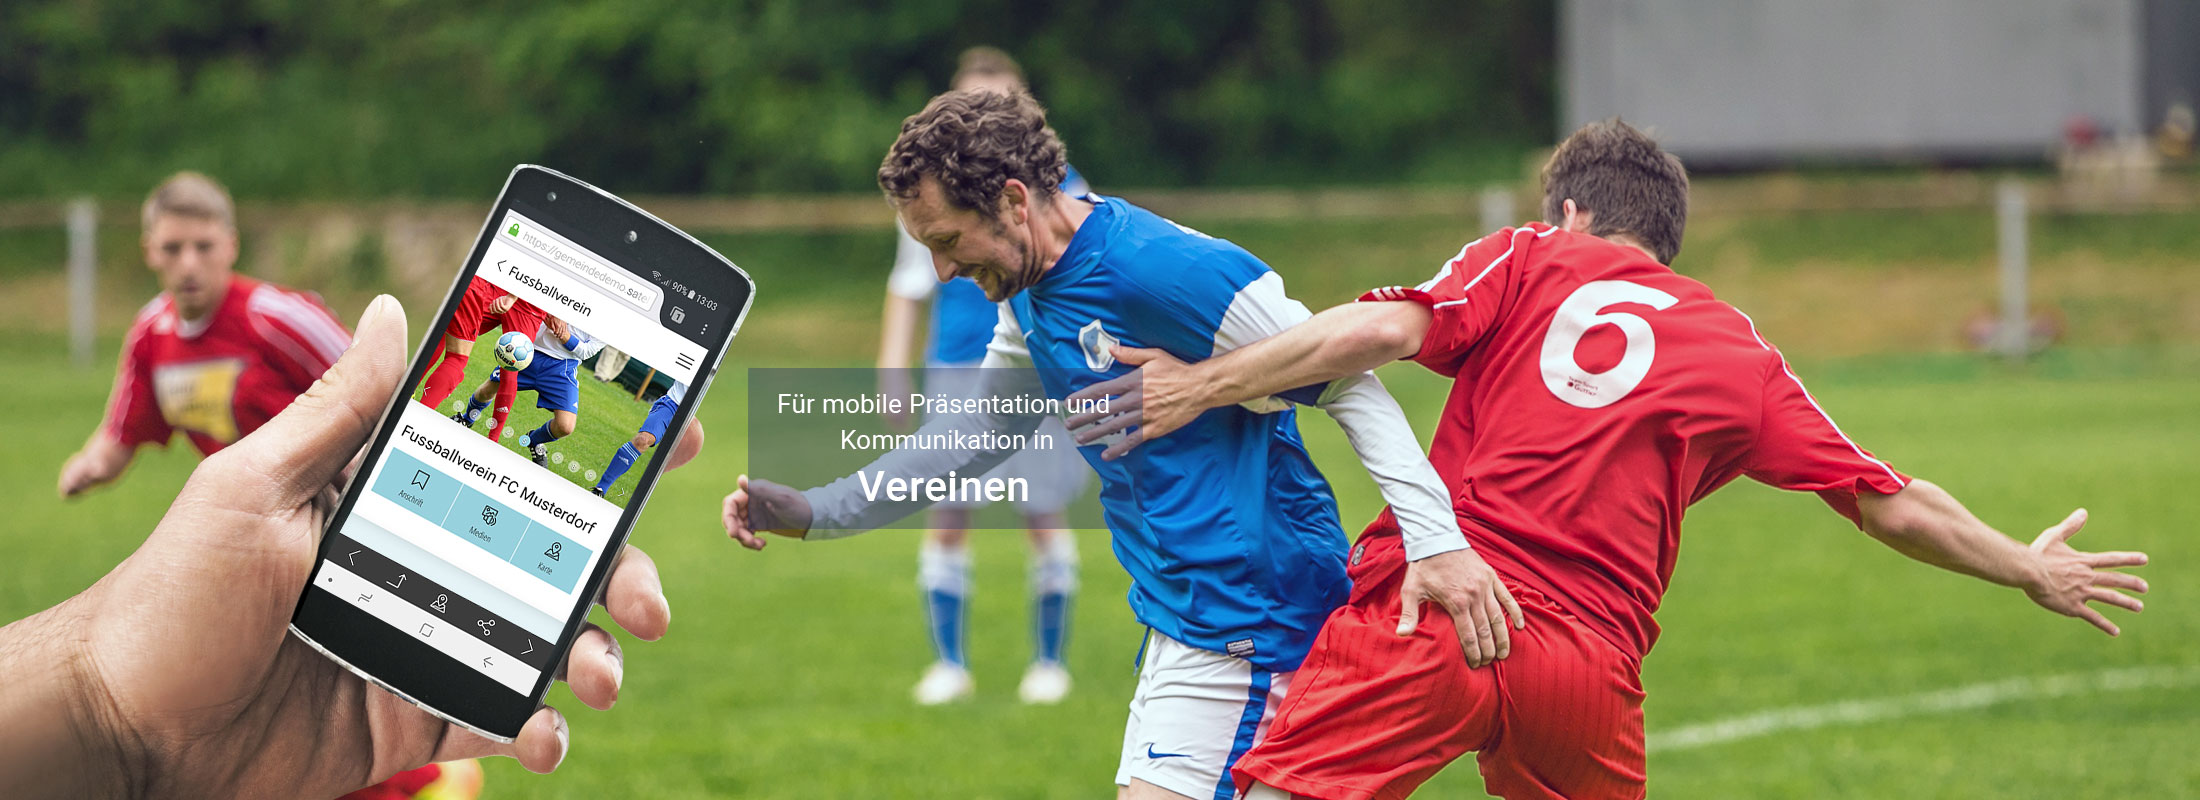 satelles mobilewebguide: Vereins App, Web App